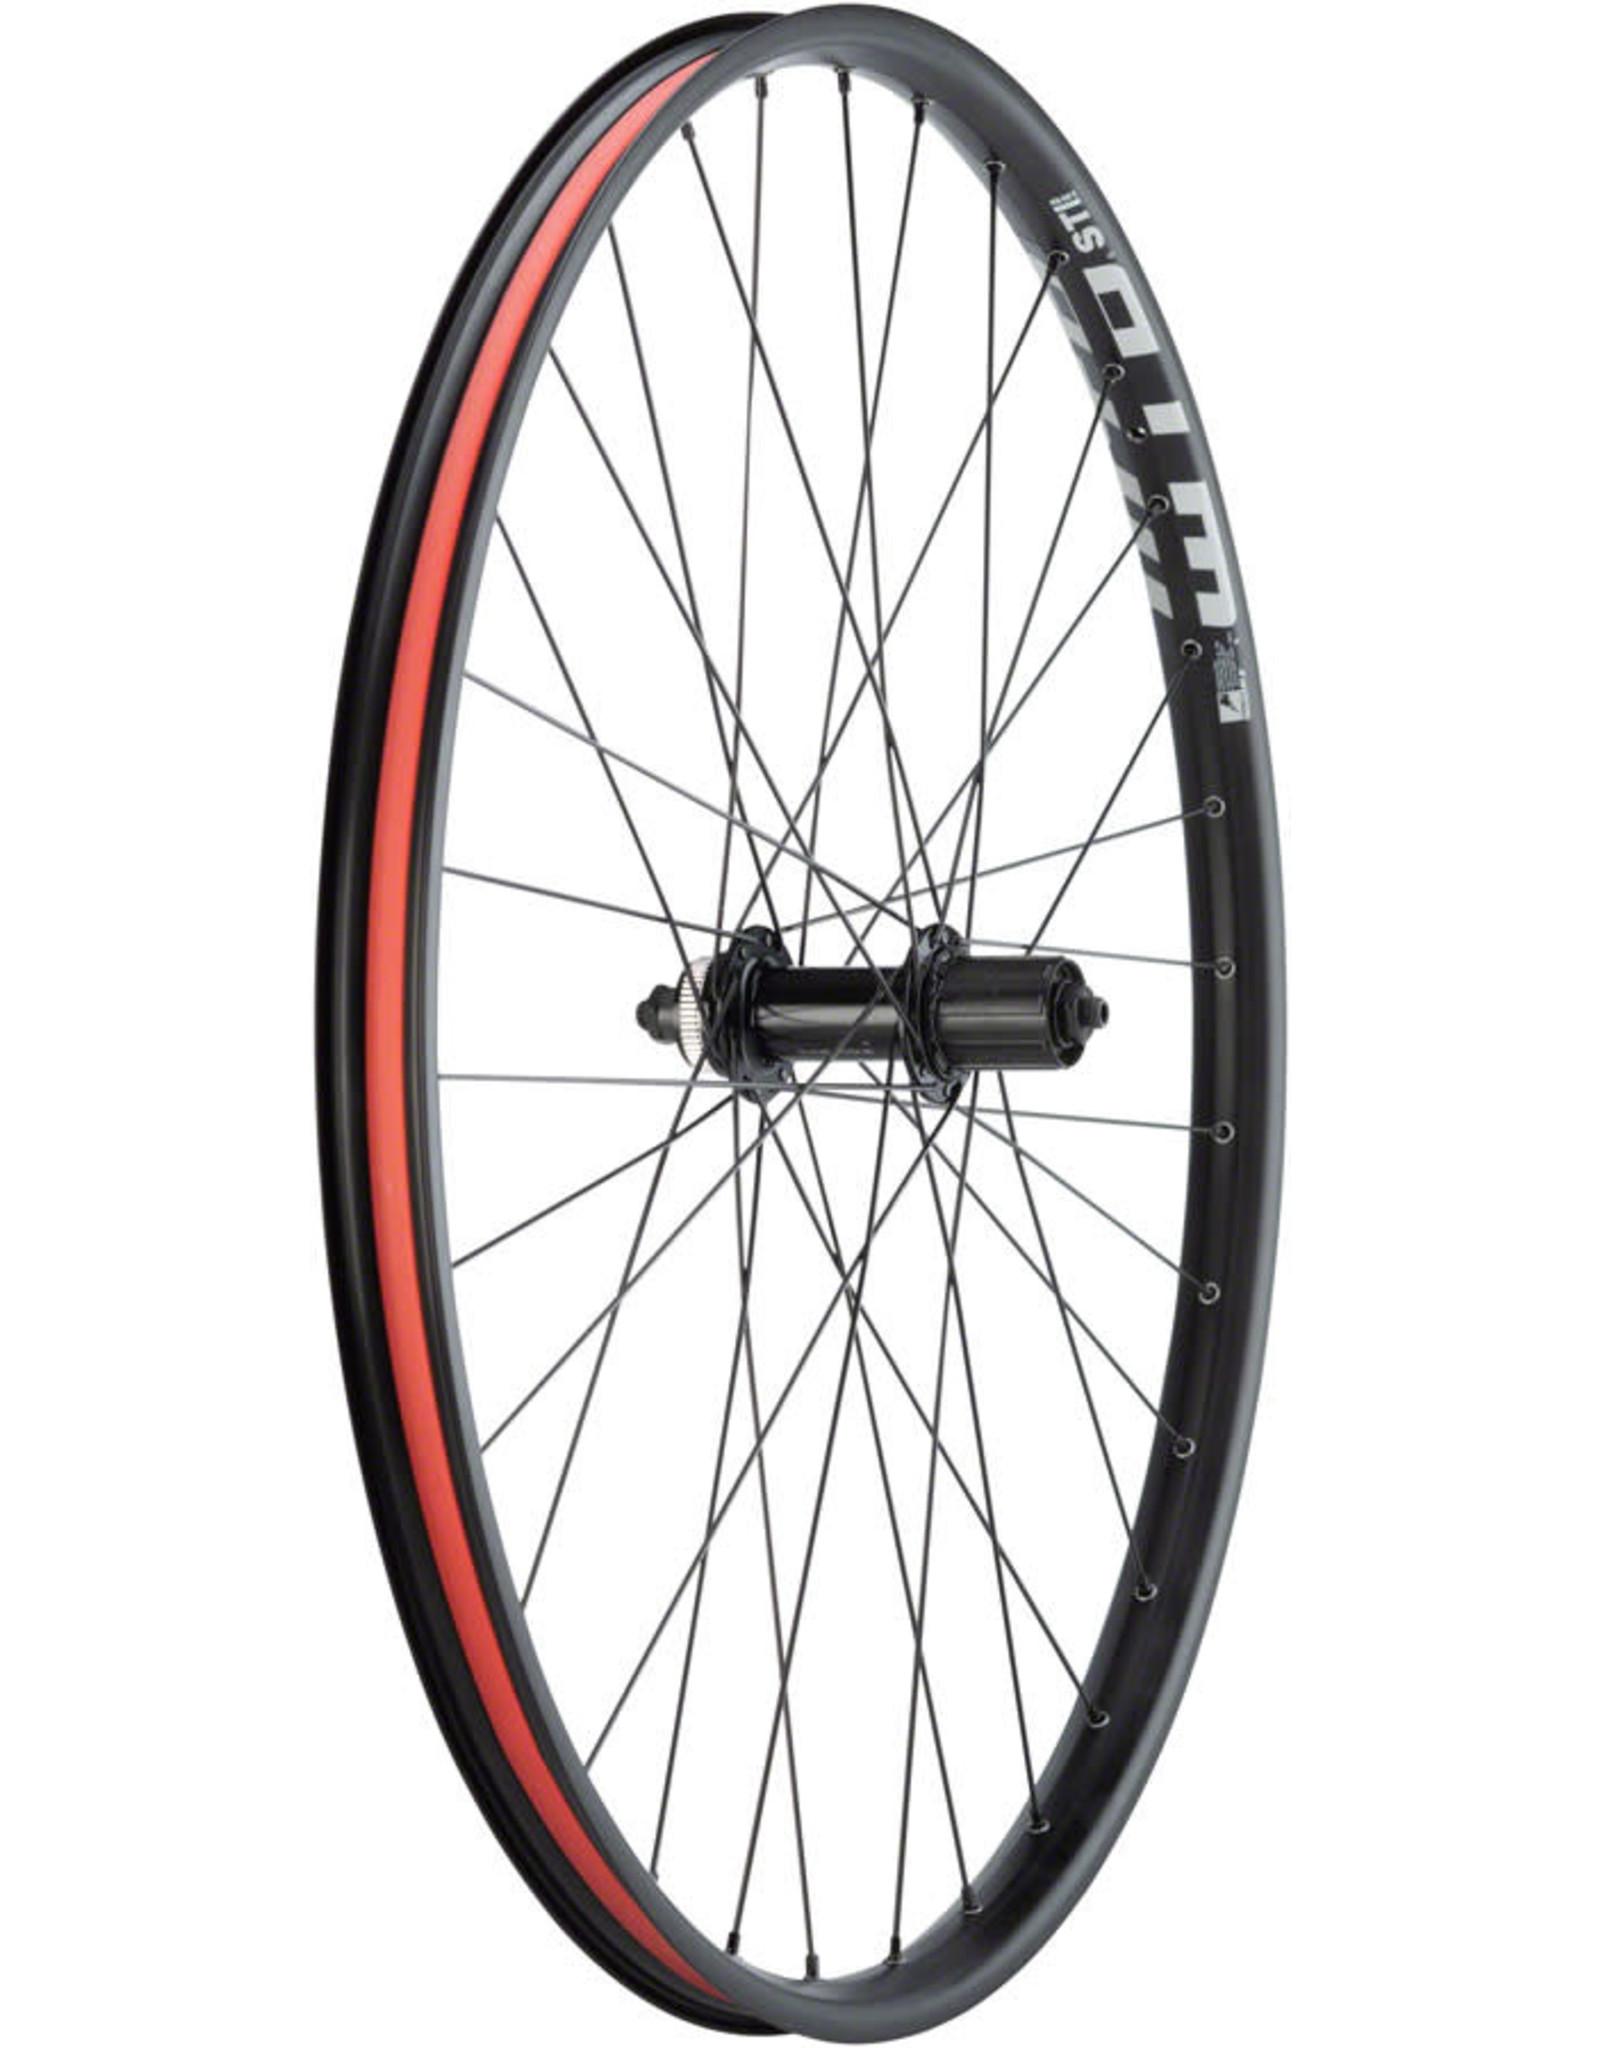 "Quality Wheels Quality Wheels WTB ST Light i29 Rear Wheel - 27.5"", QR x 141mm, Center-Lock, HG 10, Black"